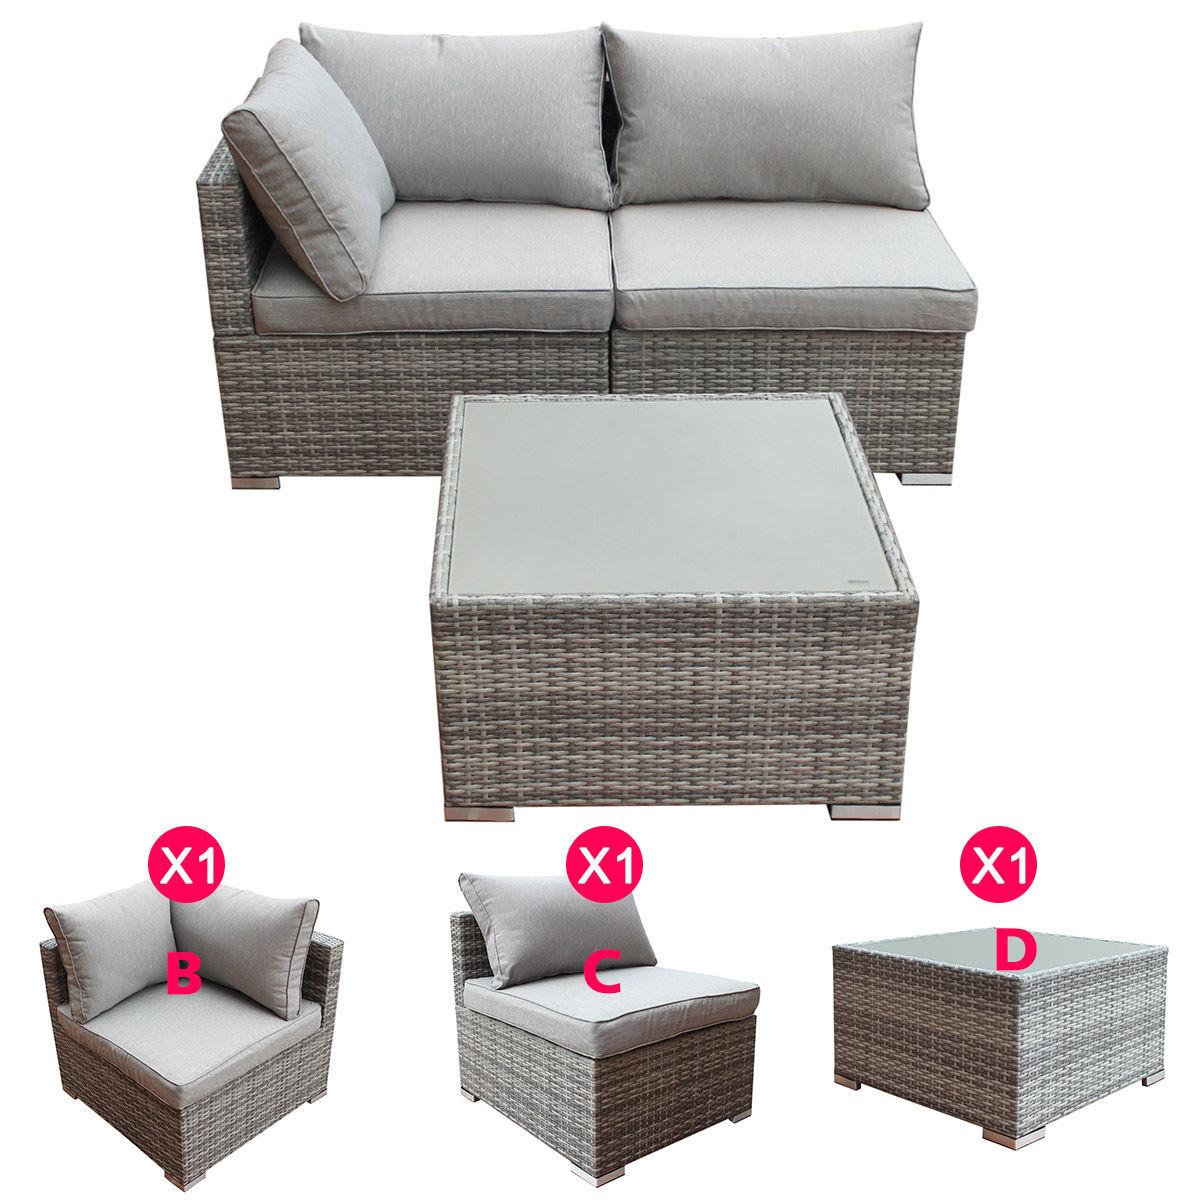 Costway 3-9pcs Patio Rattan Sofa Furniture Set Infinitely